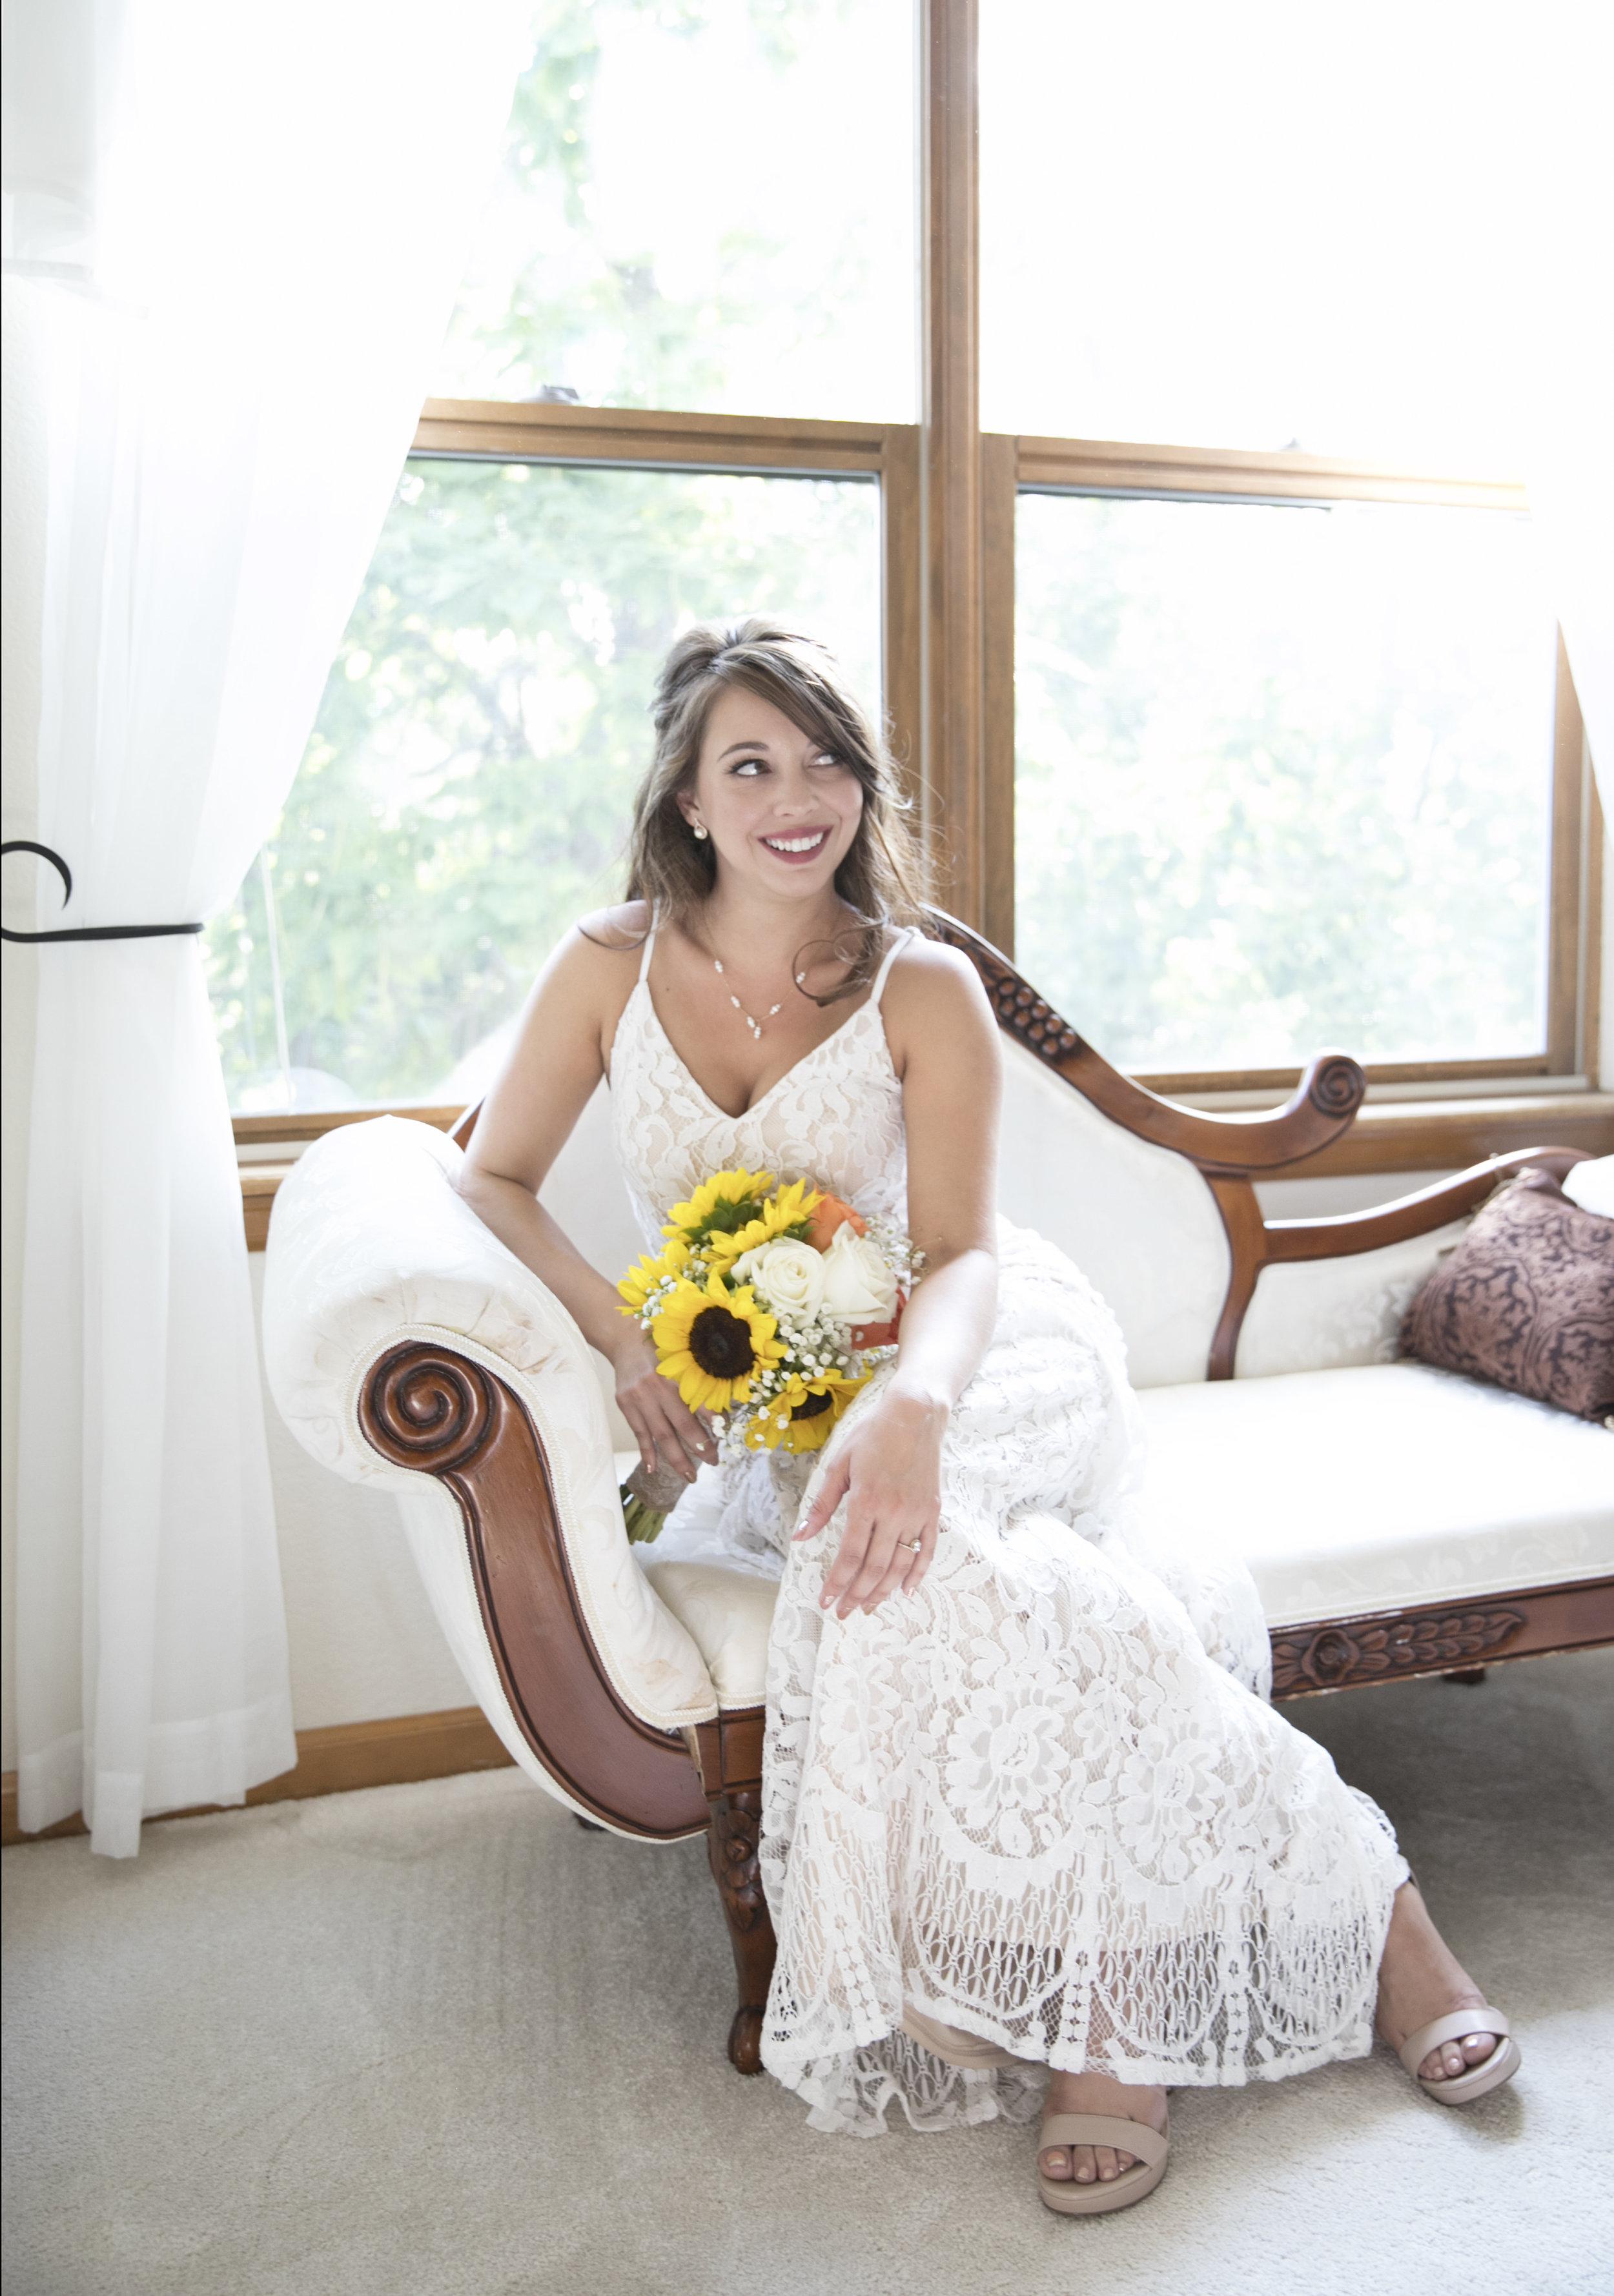 Bride on daybed.jpg